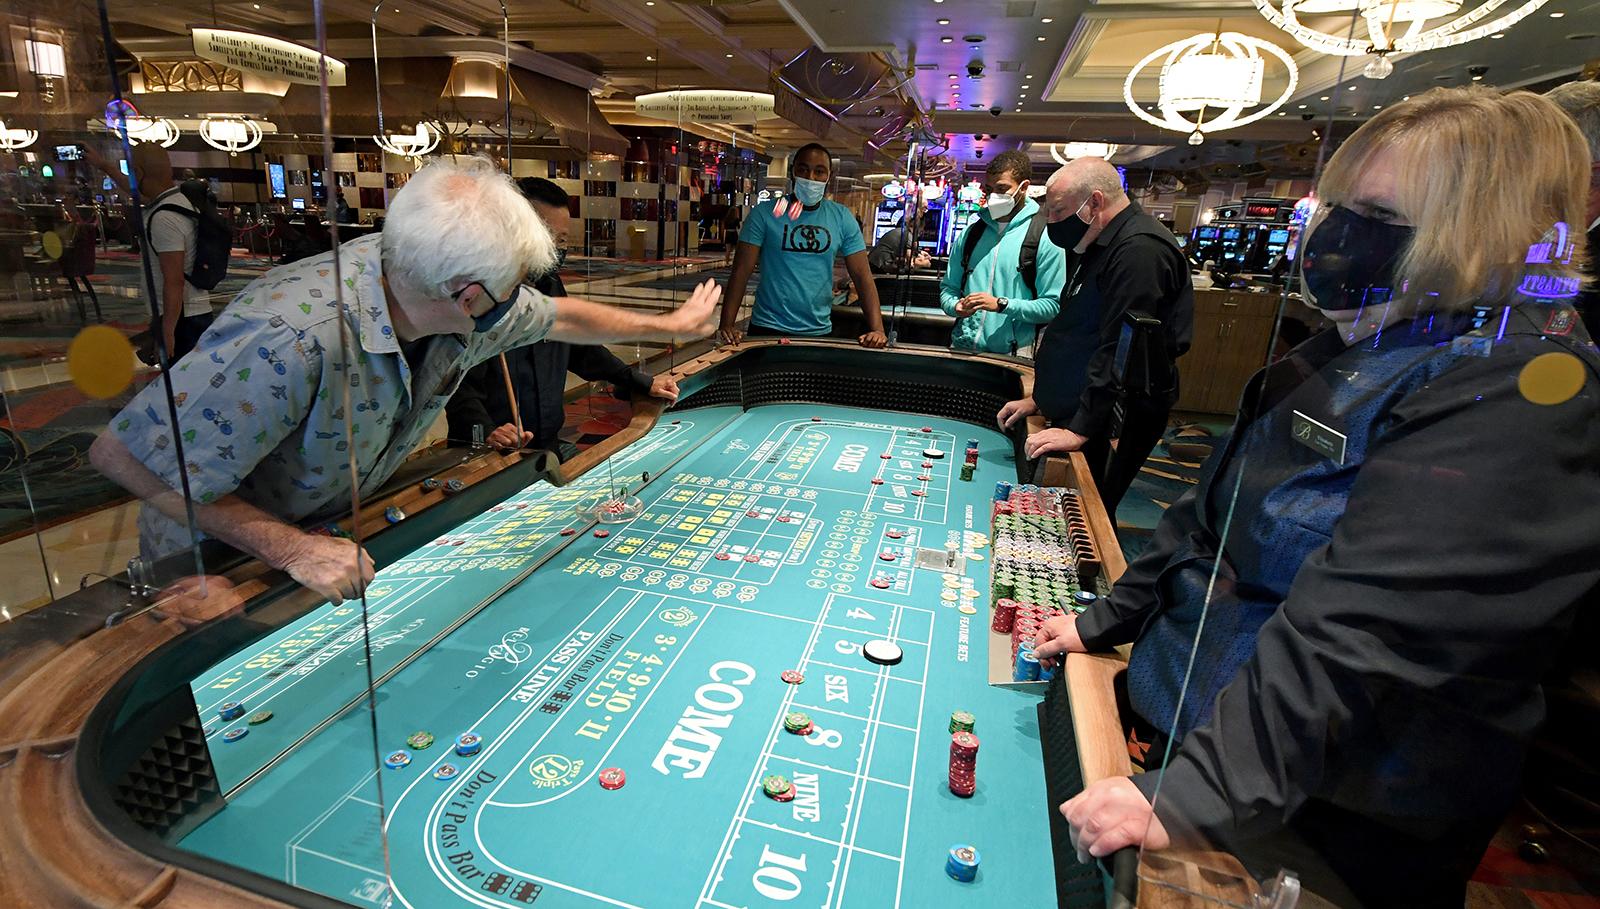 Las Vegas Reopened People Showed Up Cnn Travel